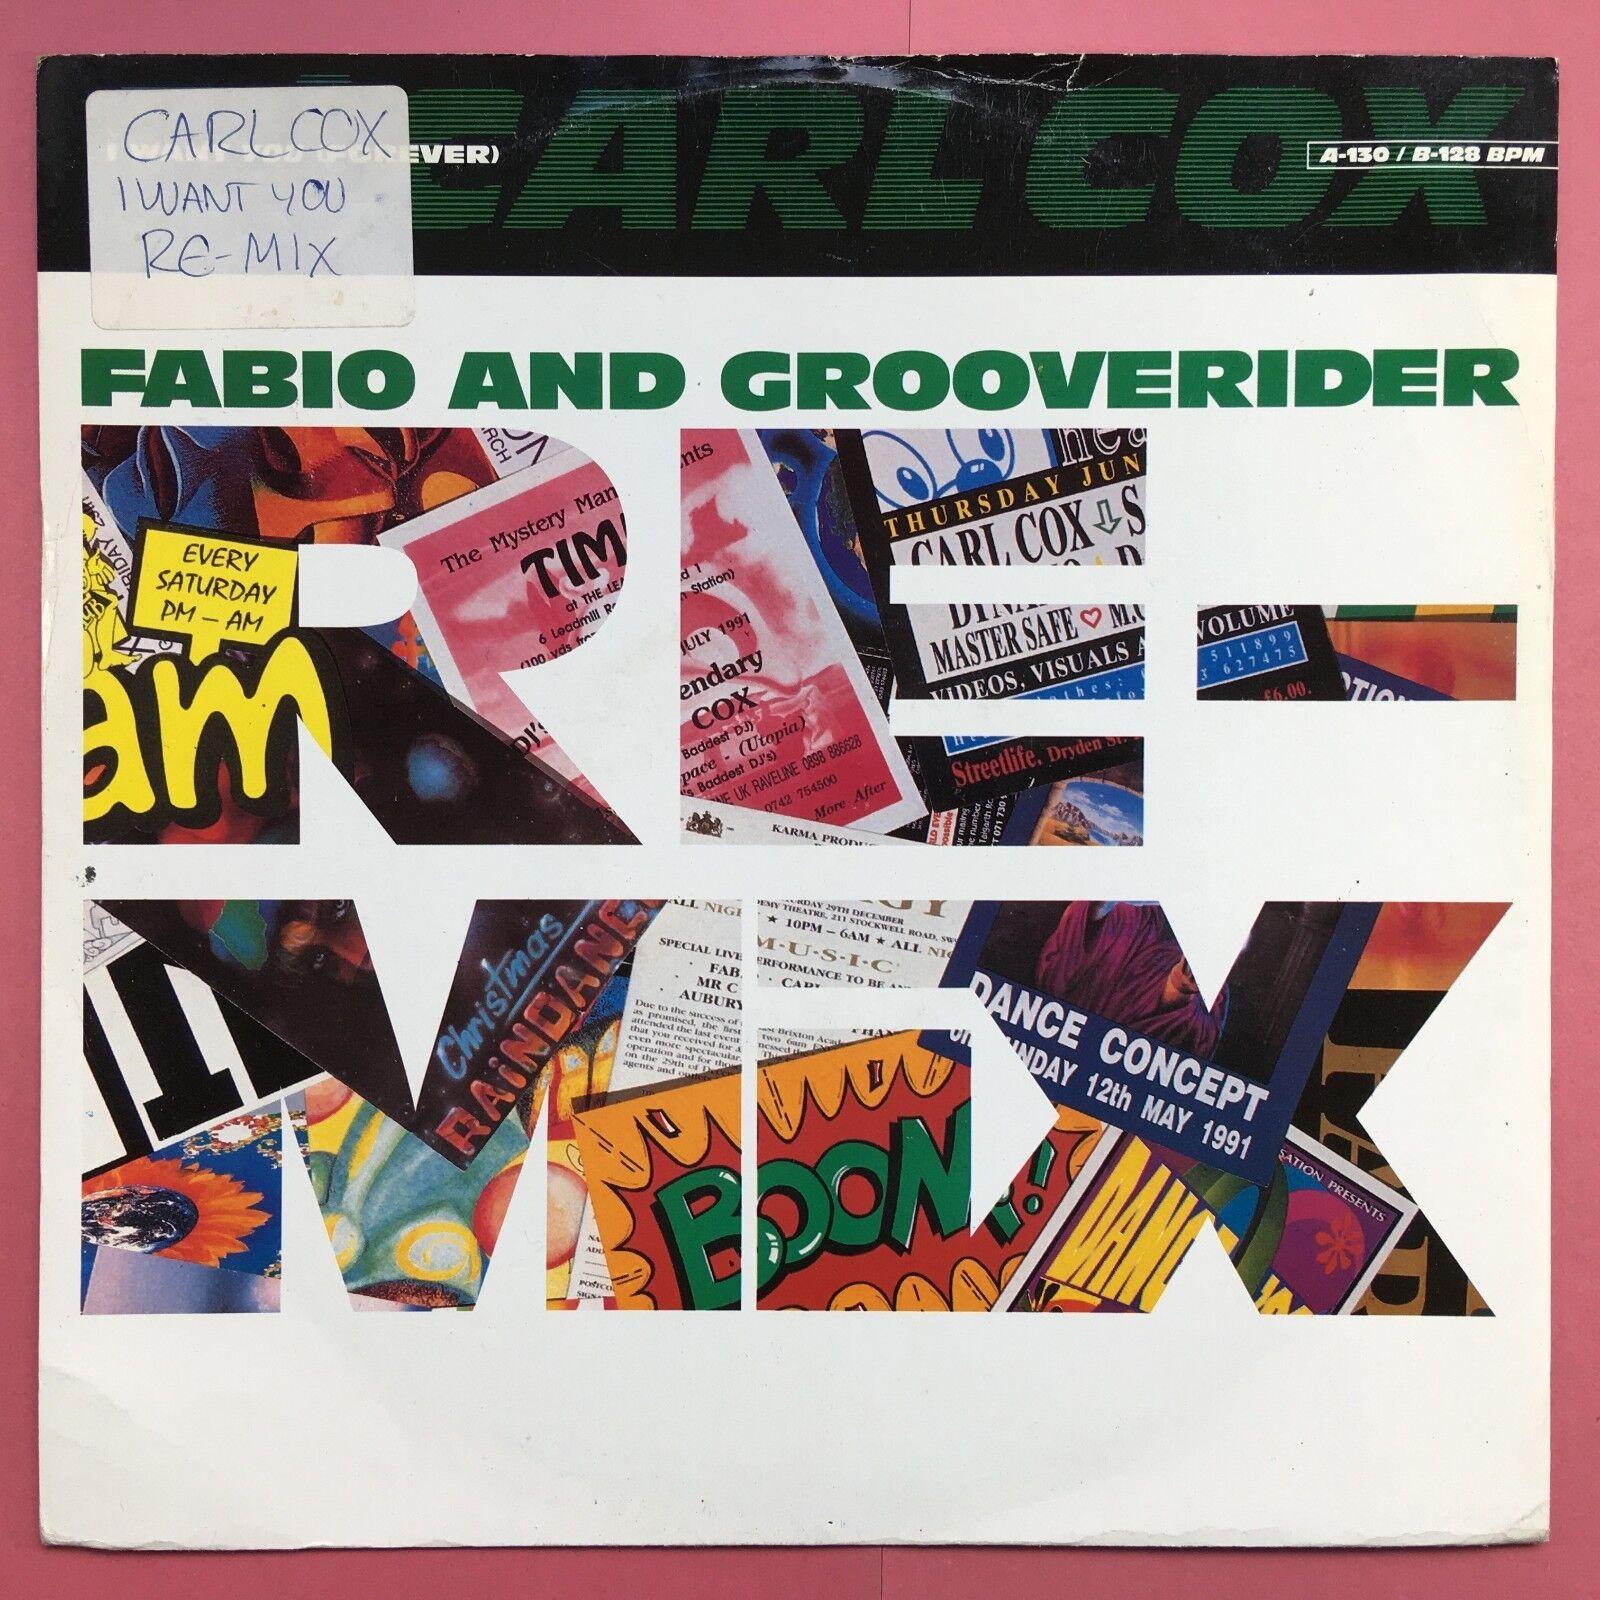 DJ Carl Cox - I Want You (örökre) - Fabio és Grooverider - PT-44938 Ex